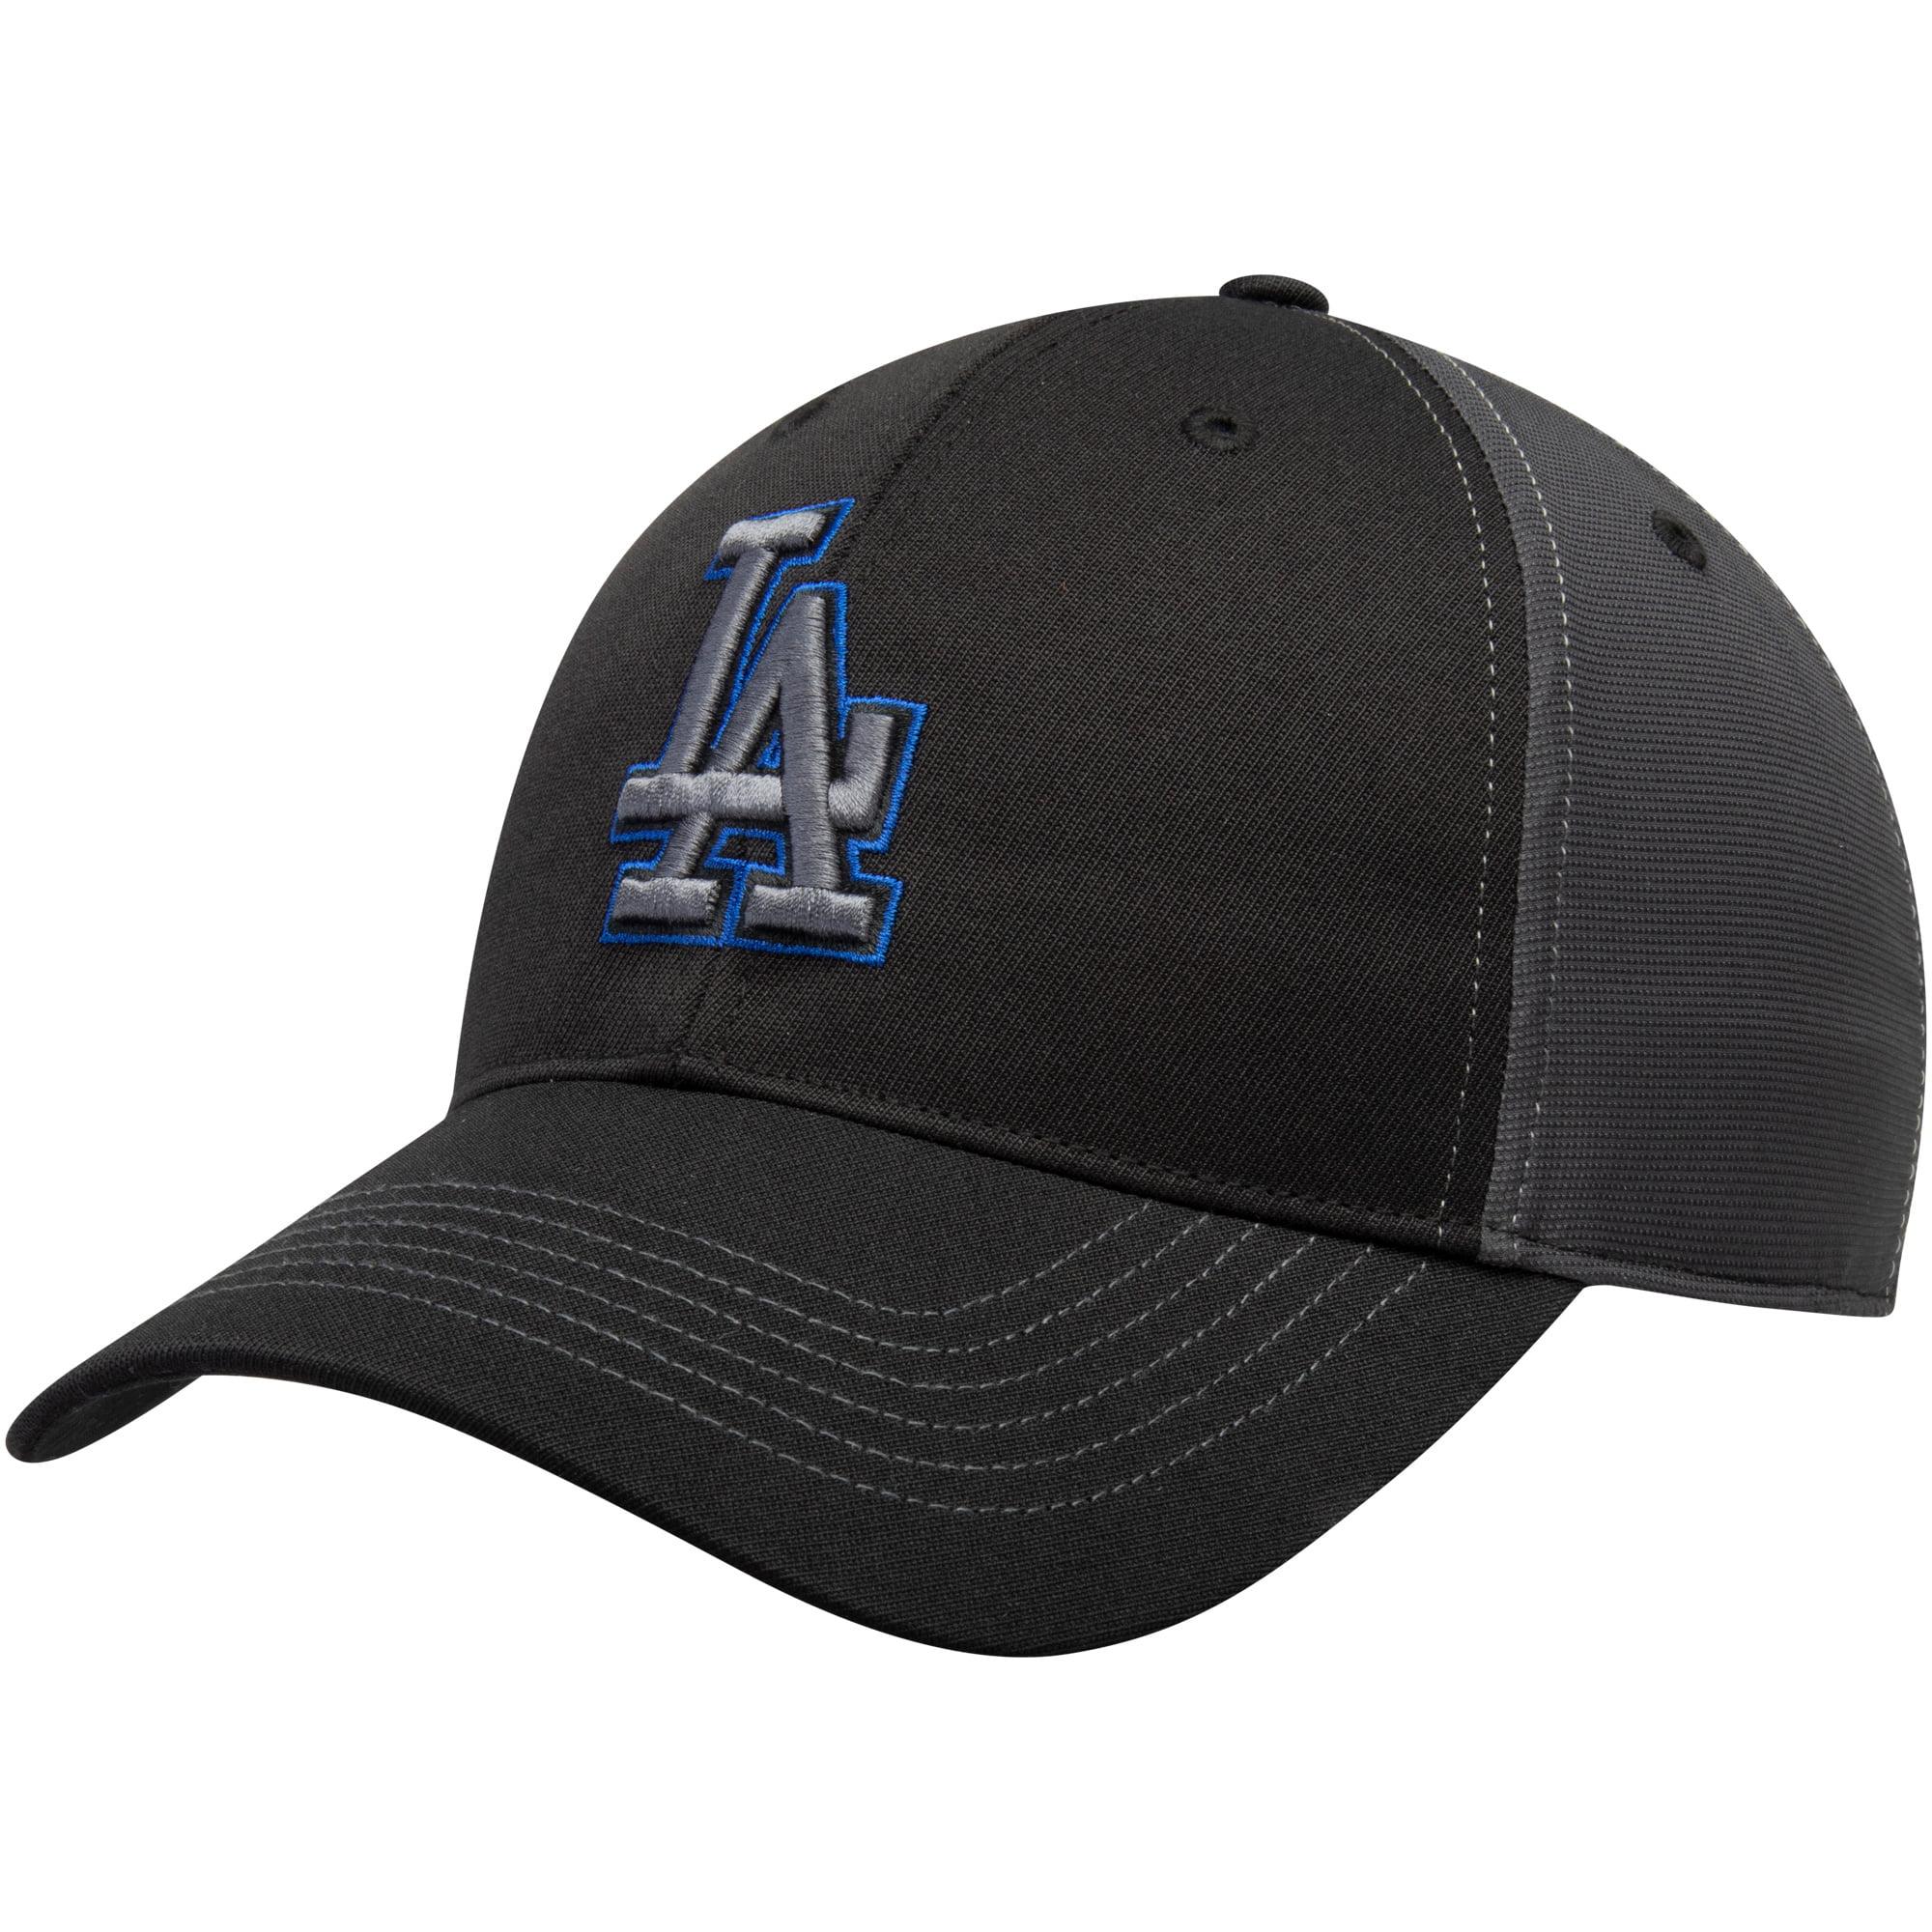 Los Angeles Dodgers Fan Favorite Blackball Adjustable Hat - Black/Charcoal - OSFA